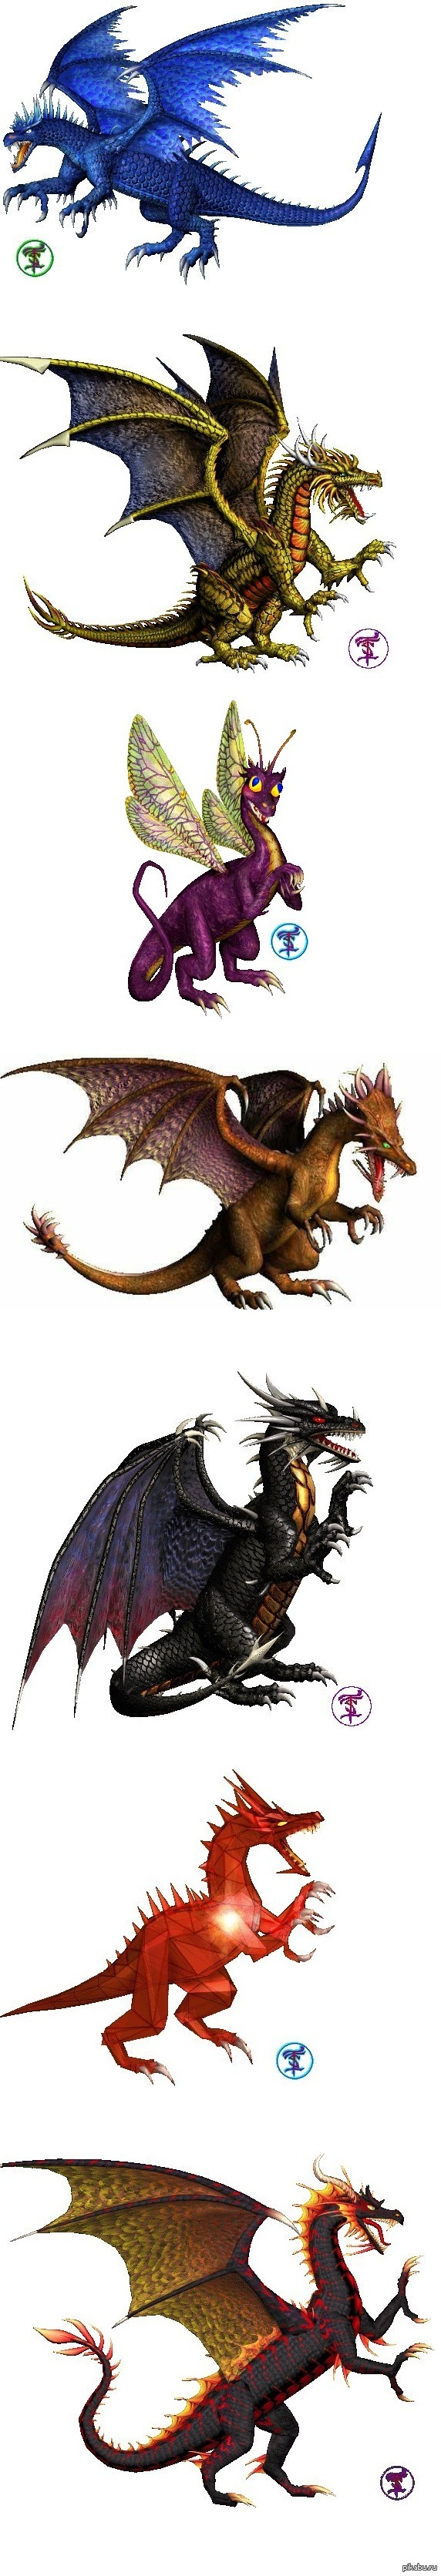 Три дракони фото 19 фотография